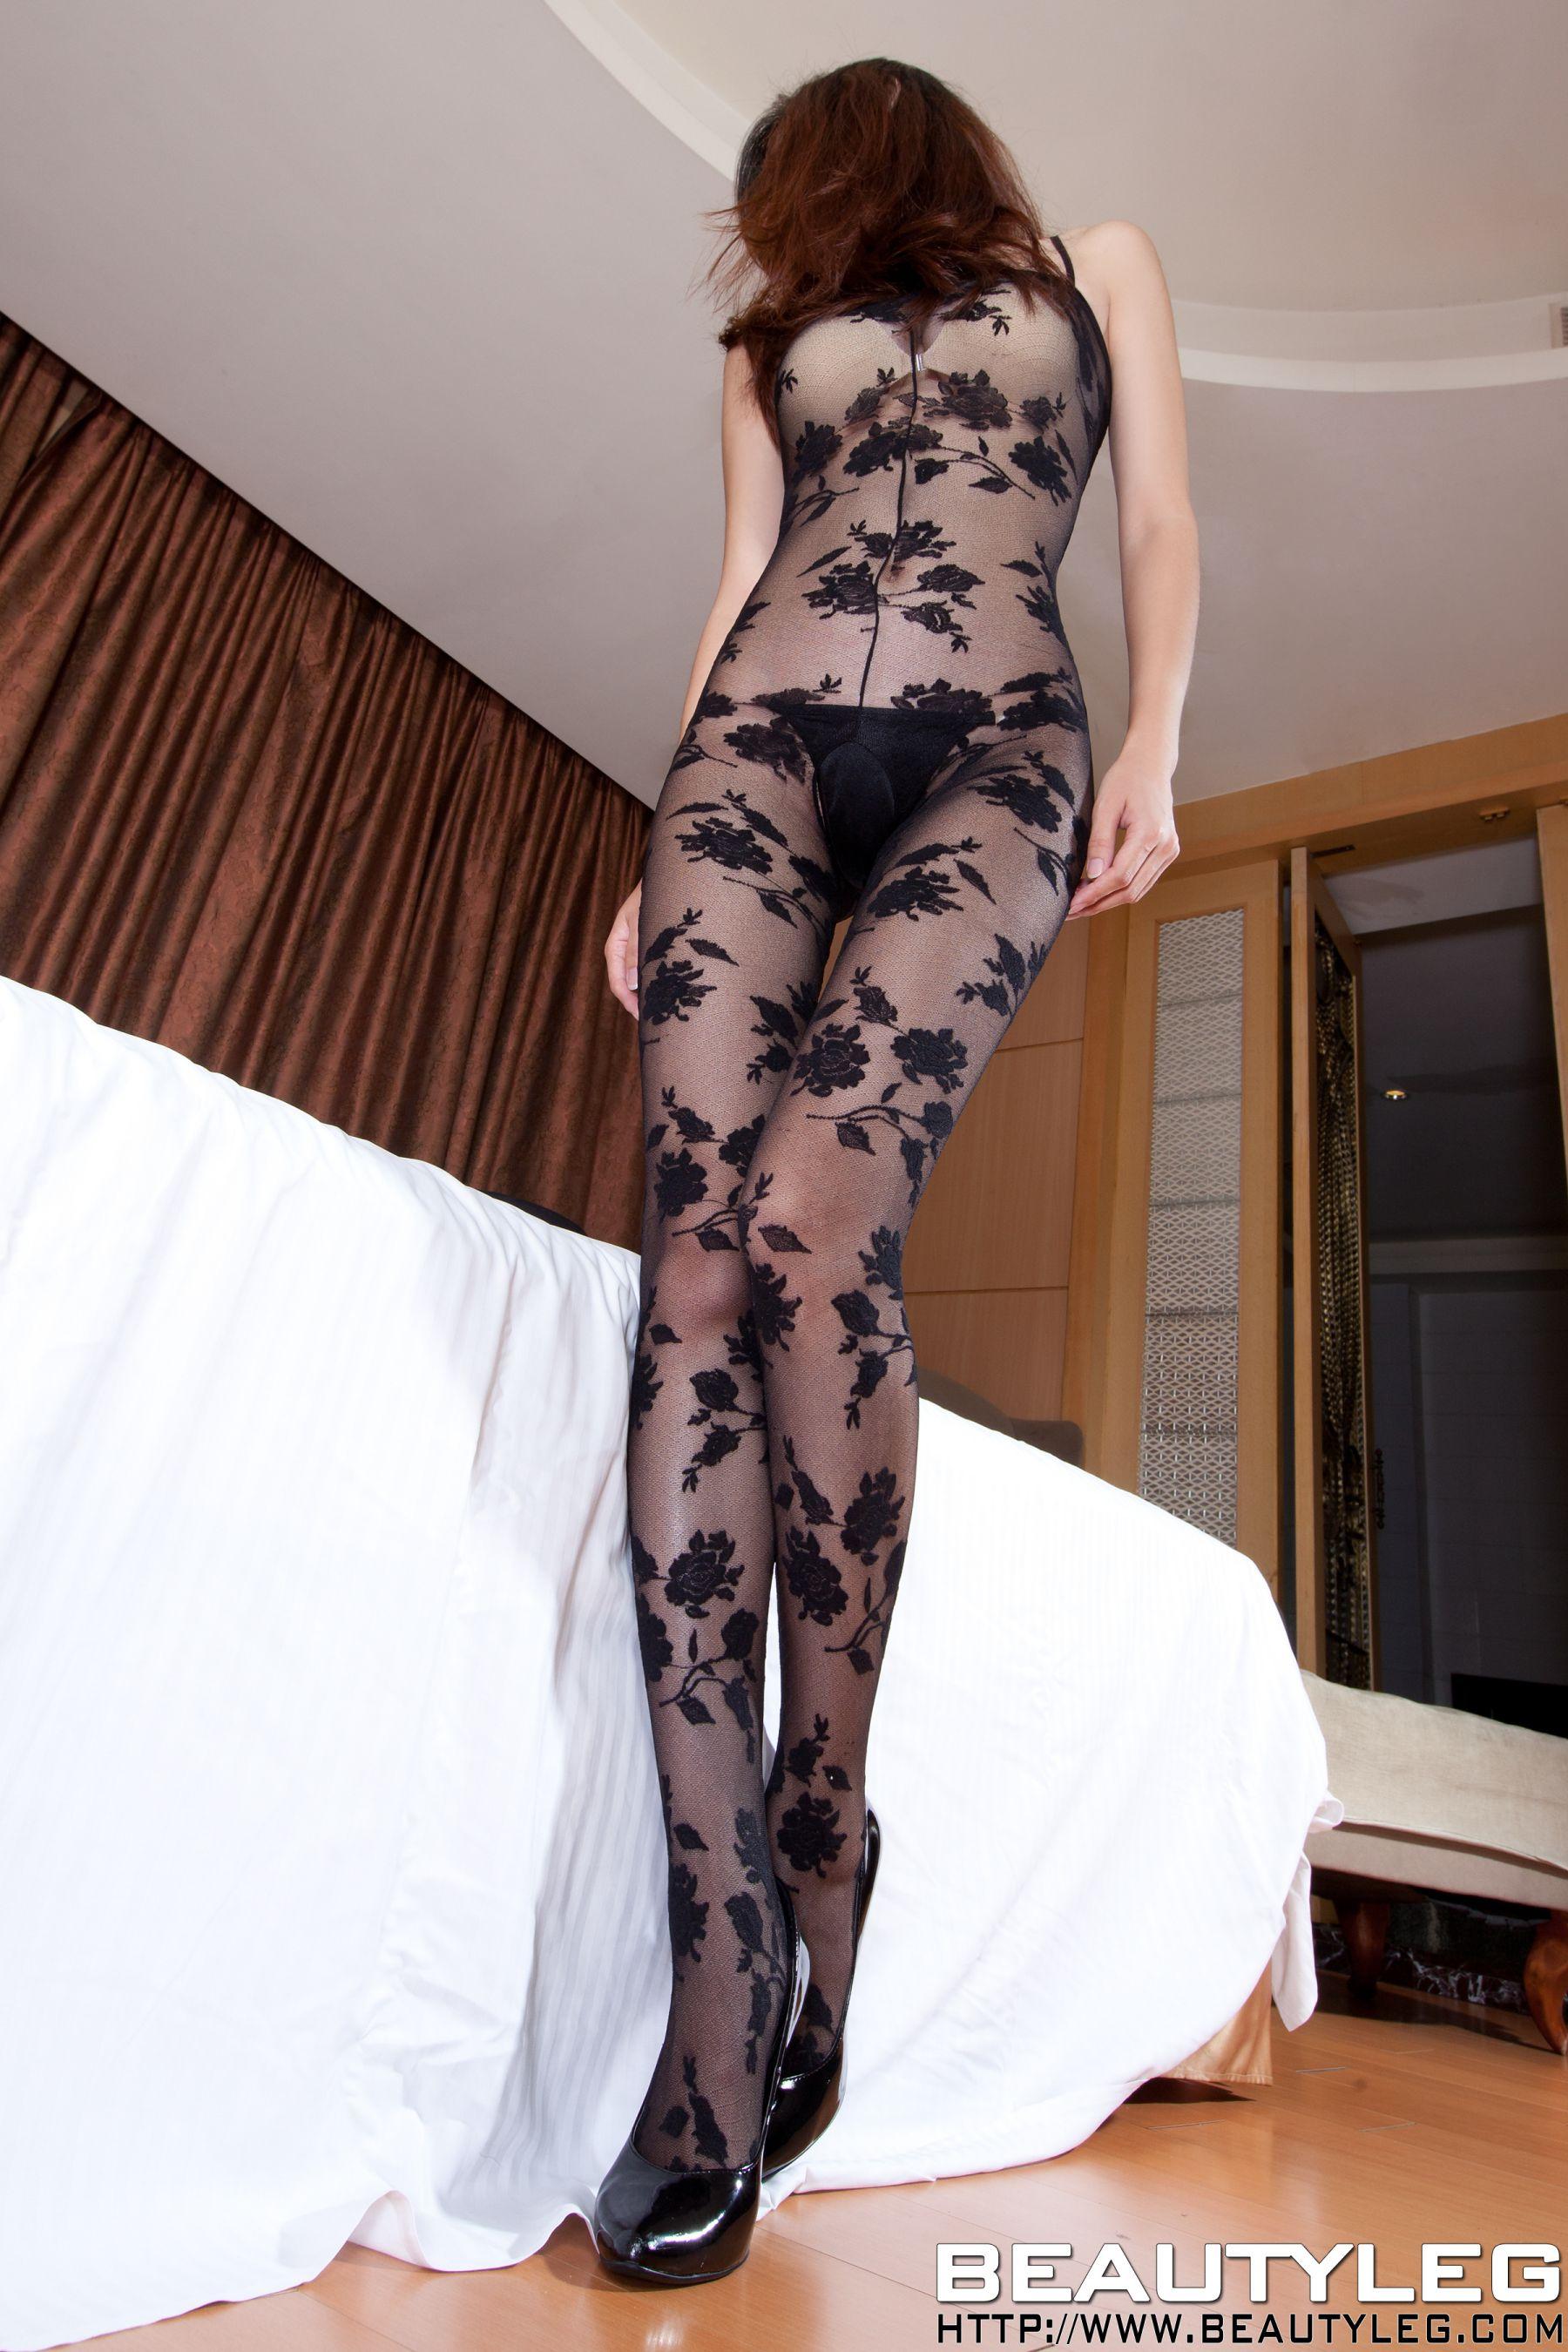 VOL.48 [Beautyleg]高跟美腿:黄苇萱(Beautyleg腿模Sunny)高品质写真套图(57P)